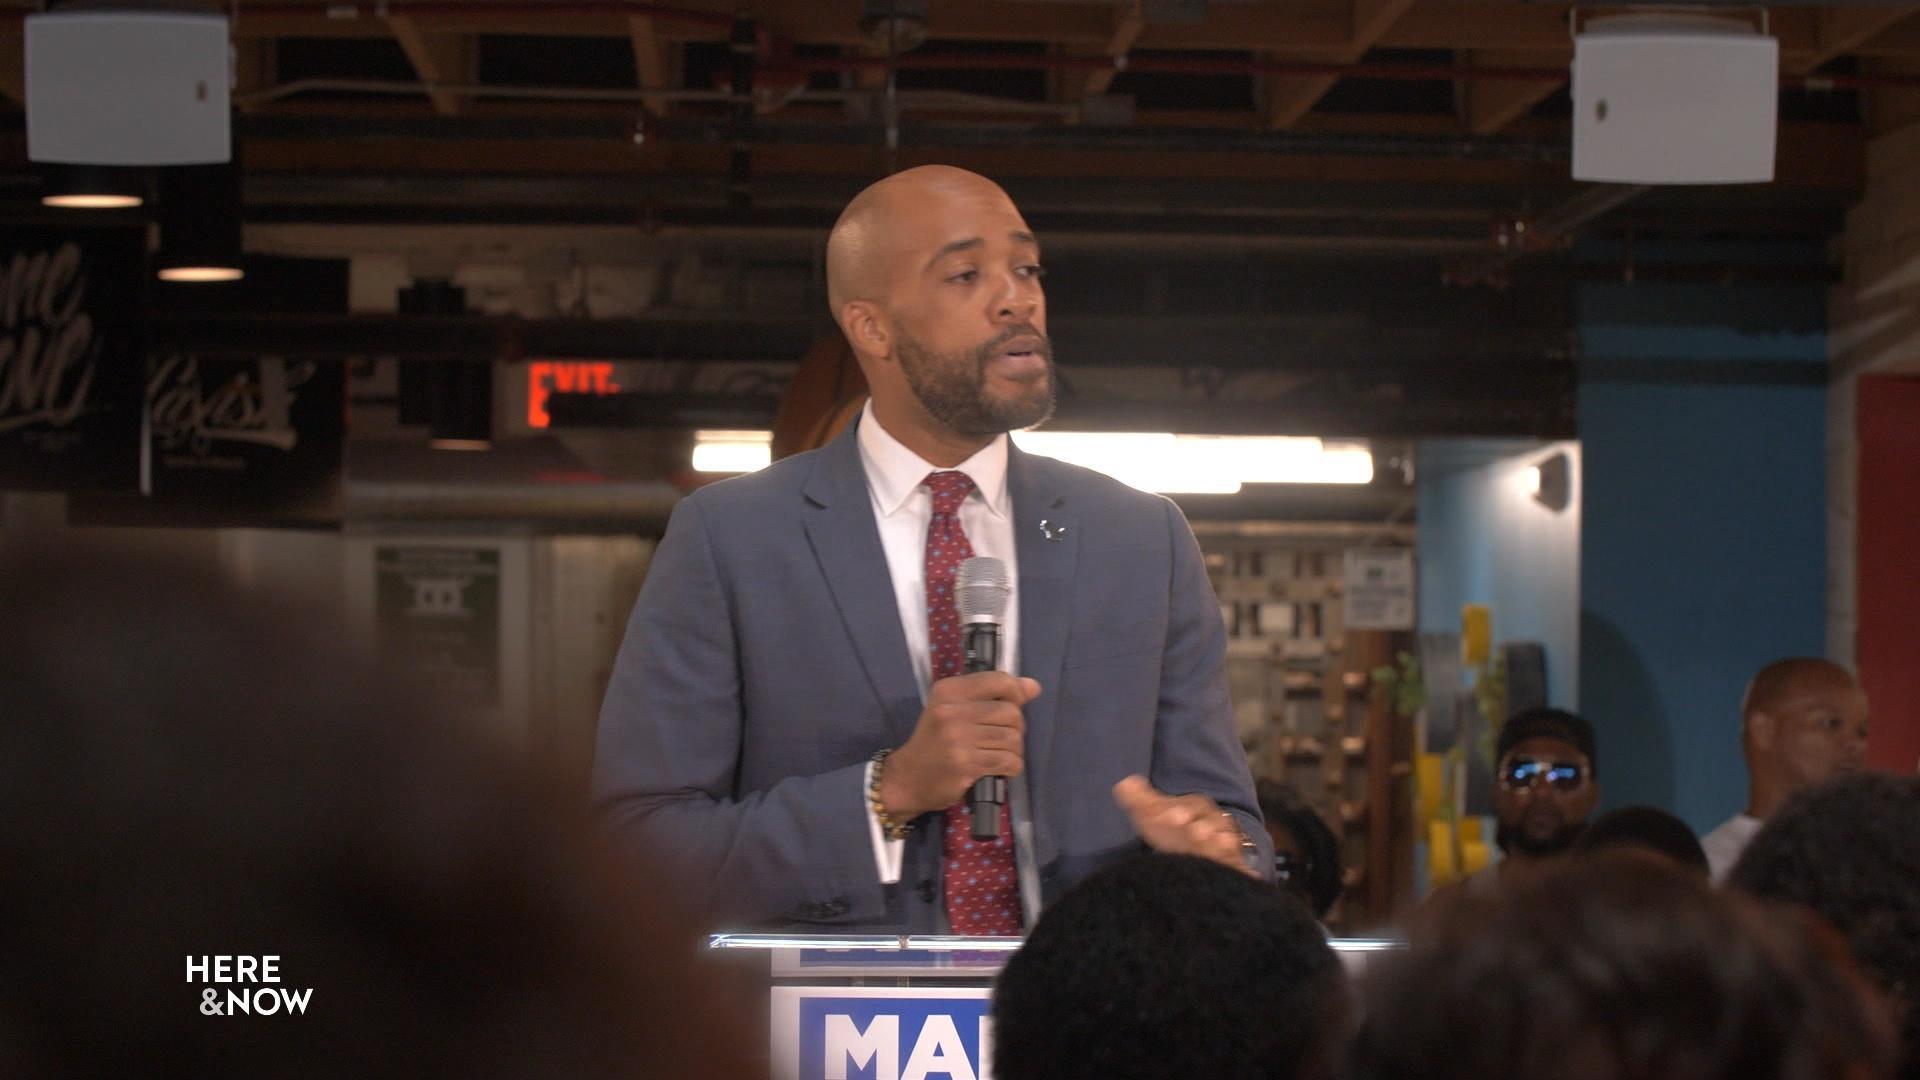 Barnes Announces U.S. Senate Run